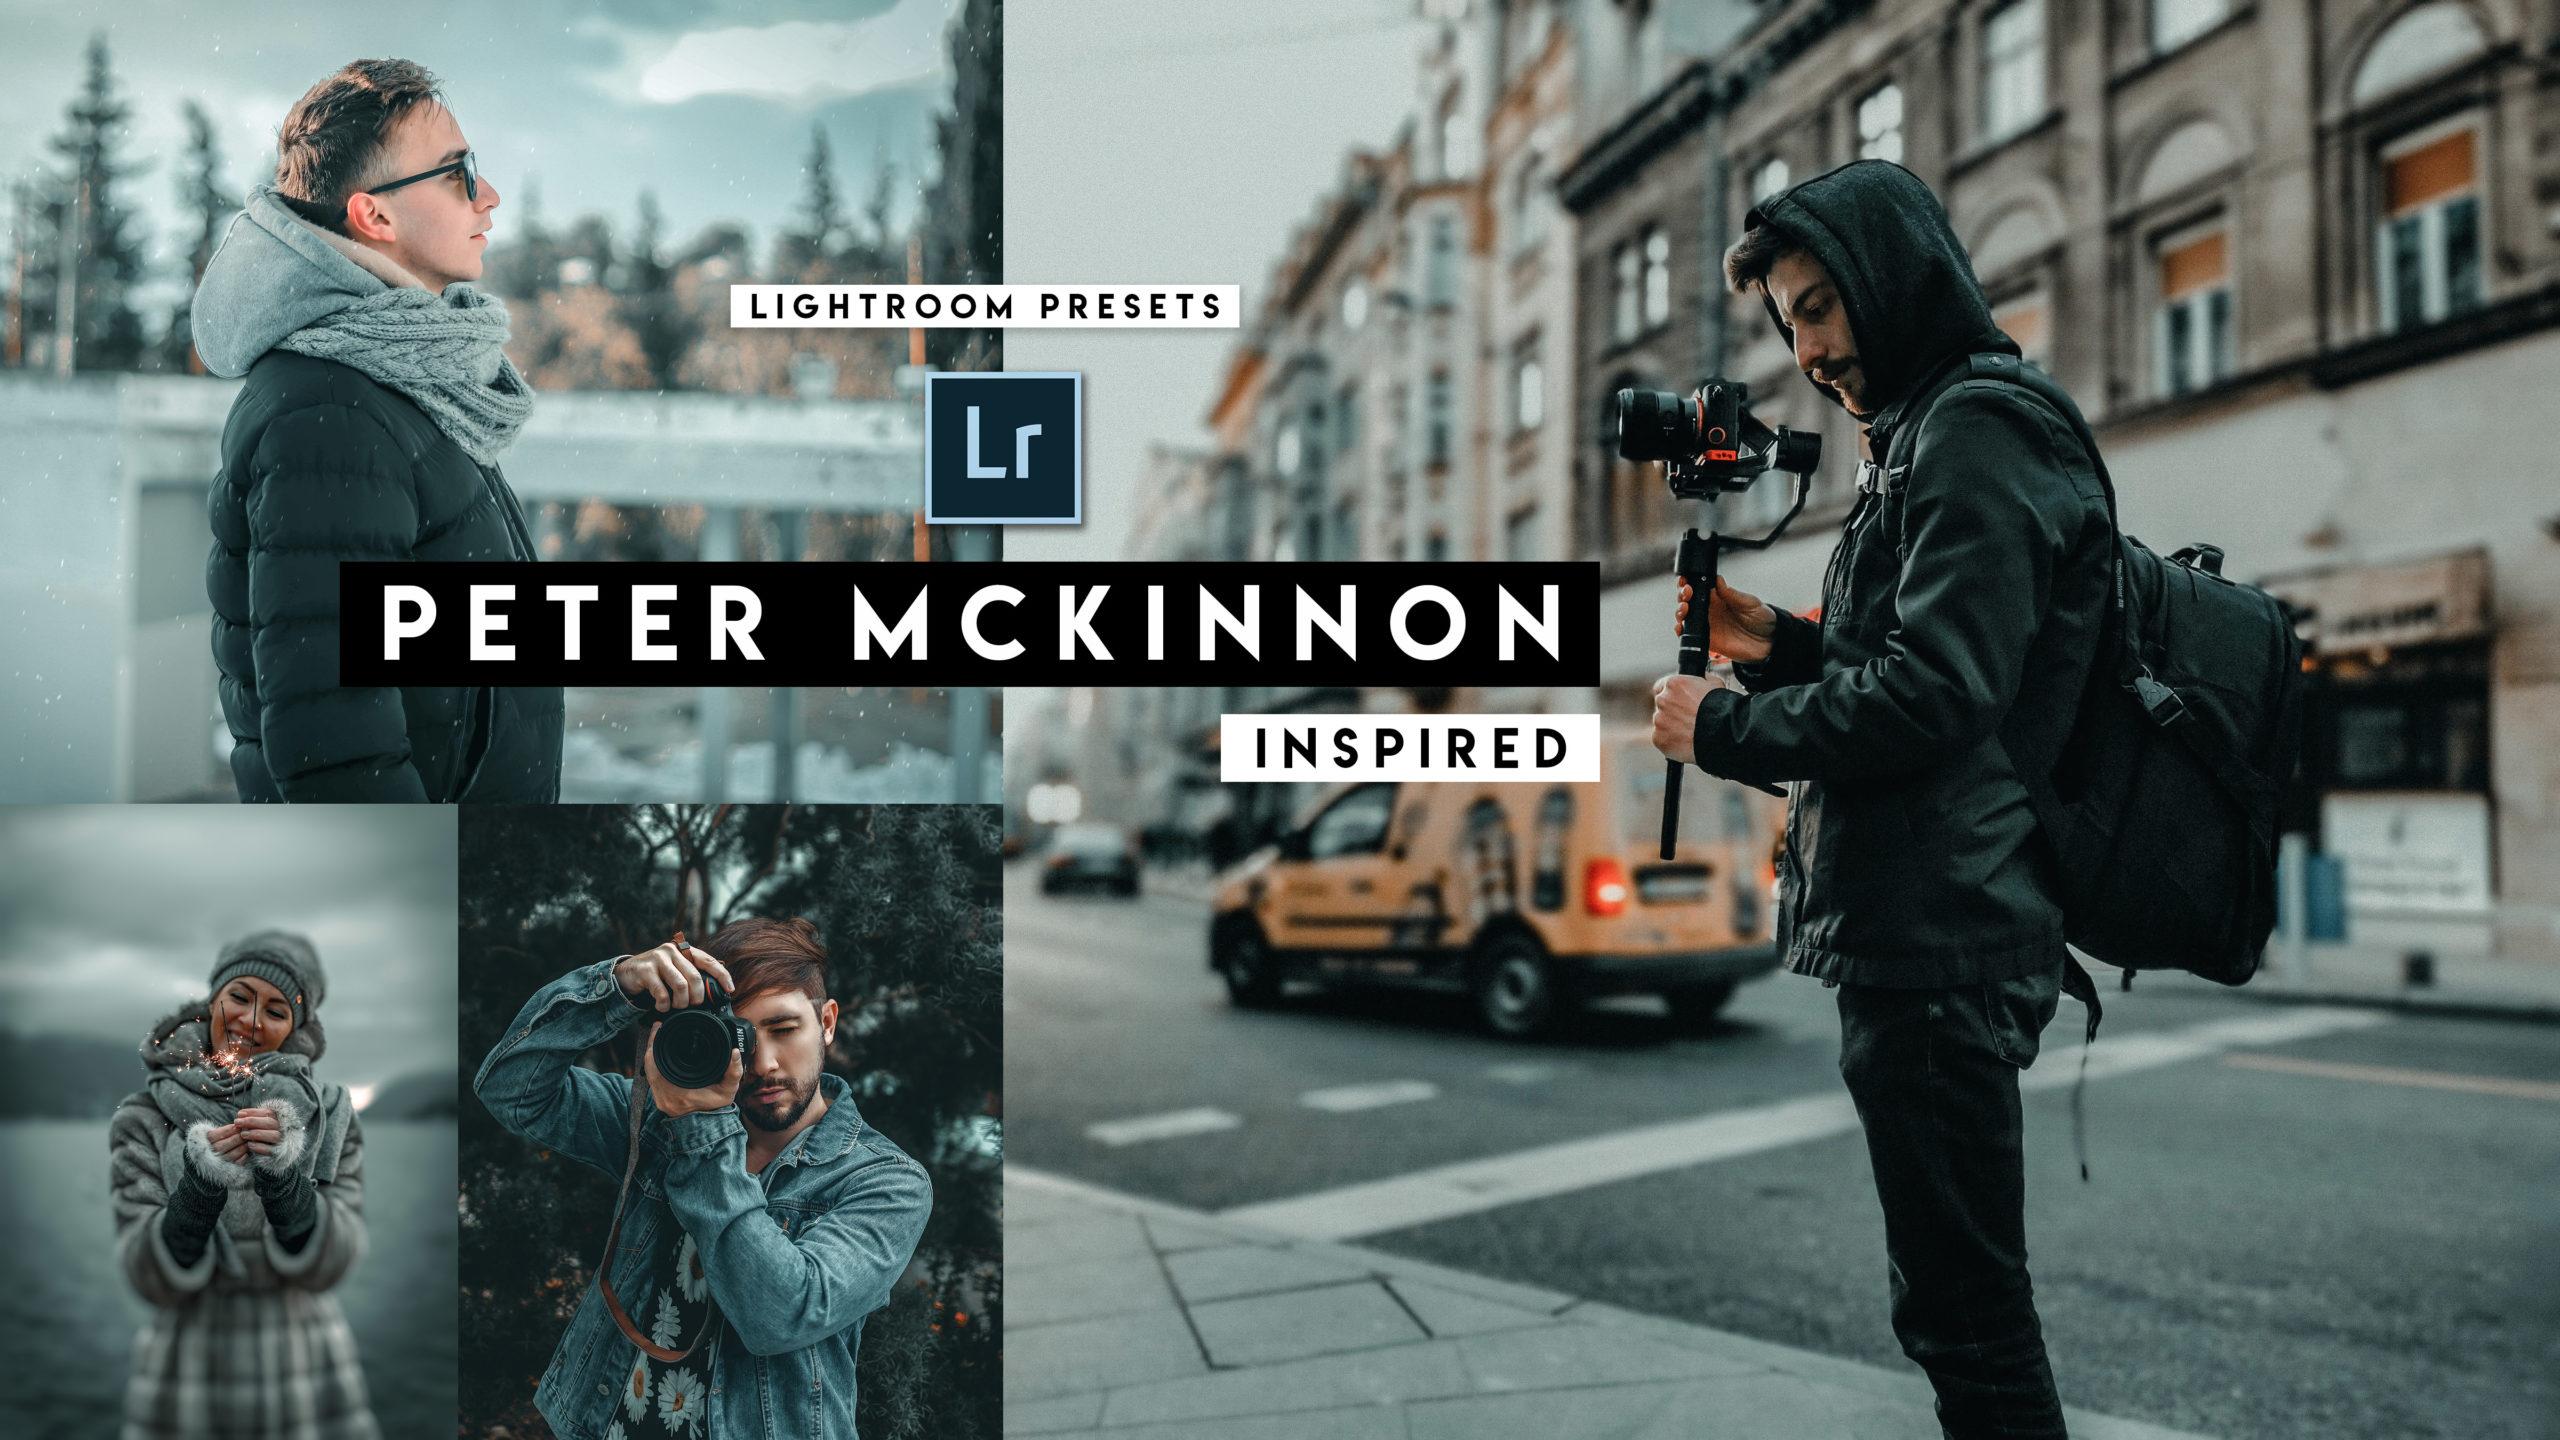 Download Peter Mckinnon Lightroom Presets of 2020 for Free | Peter ...